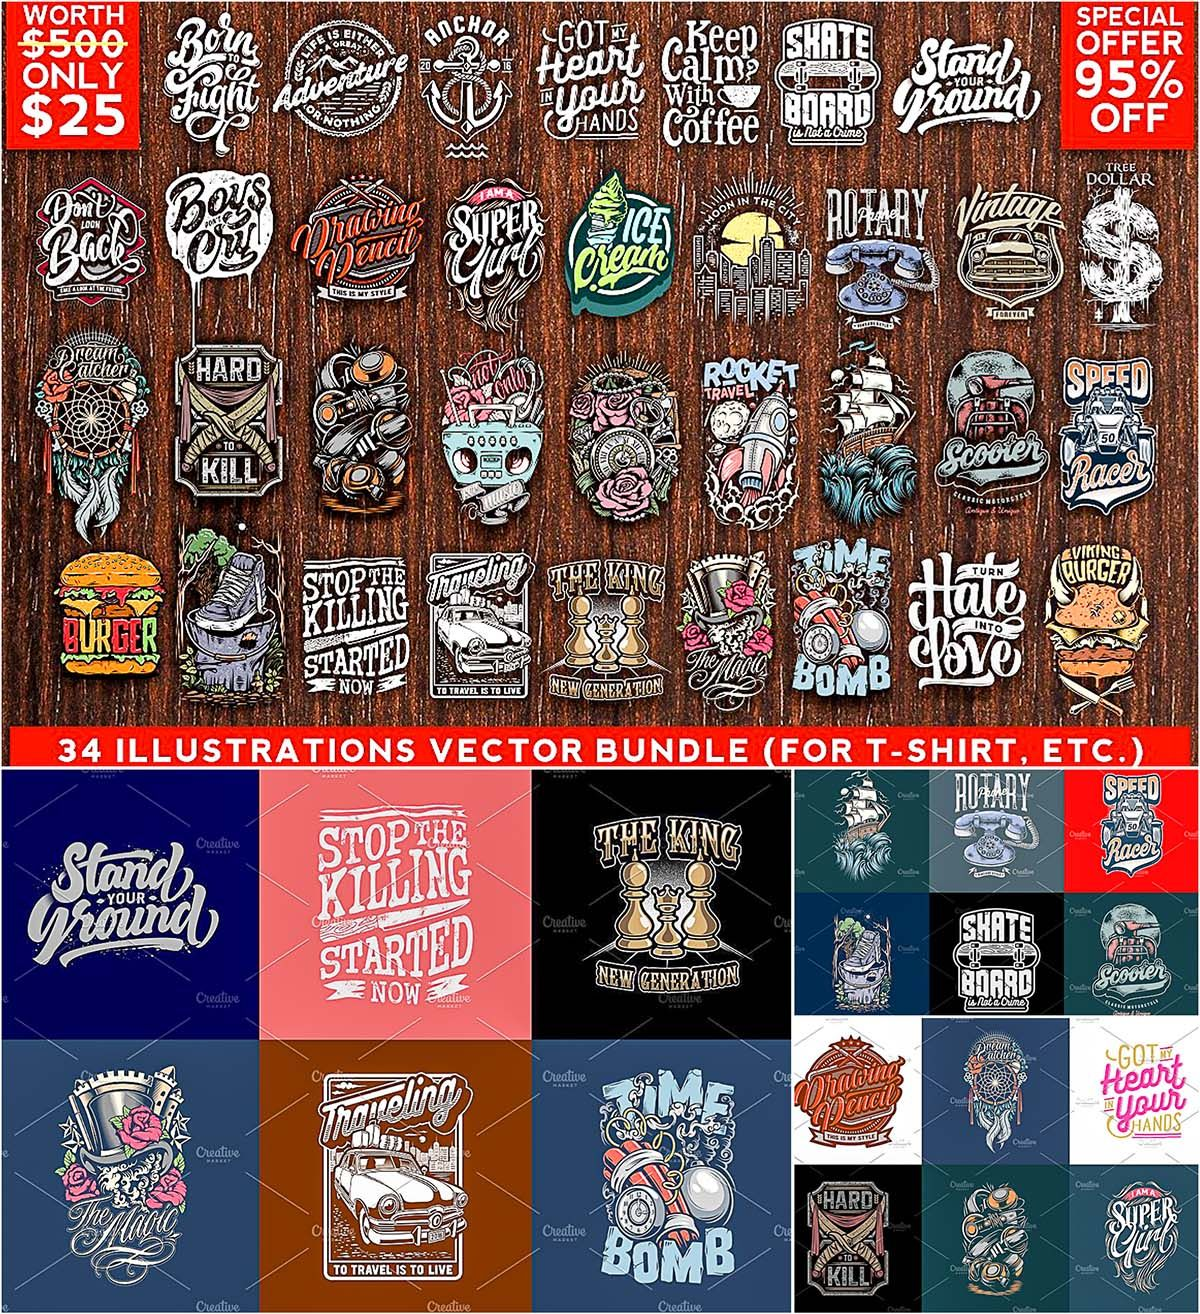 Illustrations Vector Bundle Free Download Free Tshirt Design Free Shirt Design Free T Shirt Design